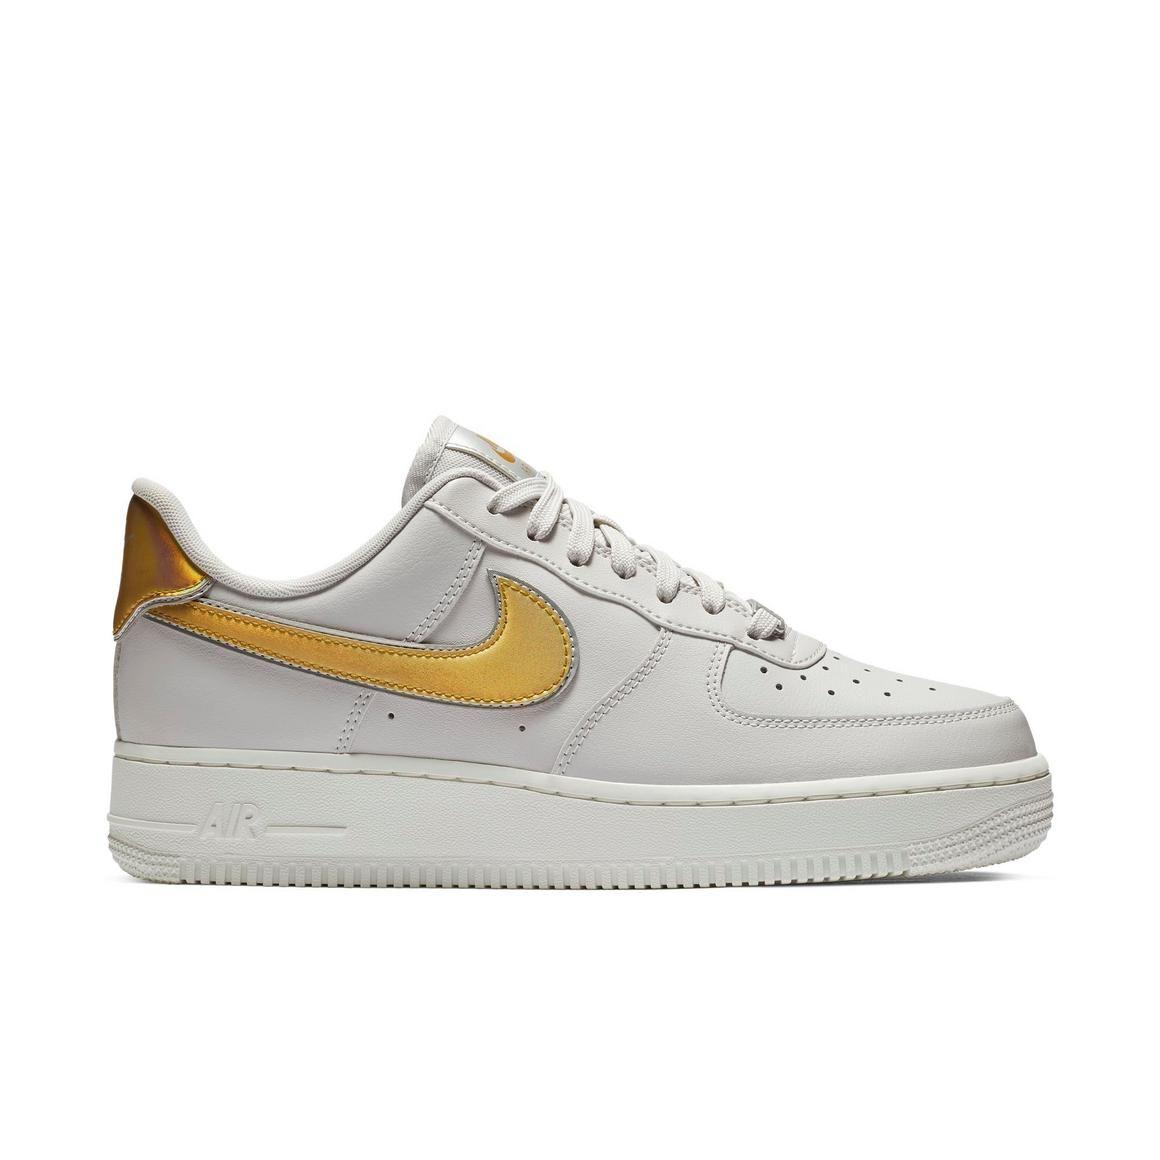 "Nike Air Force 1 '07 ""Vast Grey/Metallic Gold"" Women's"